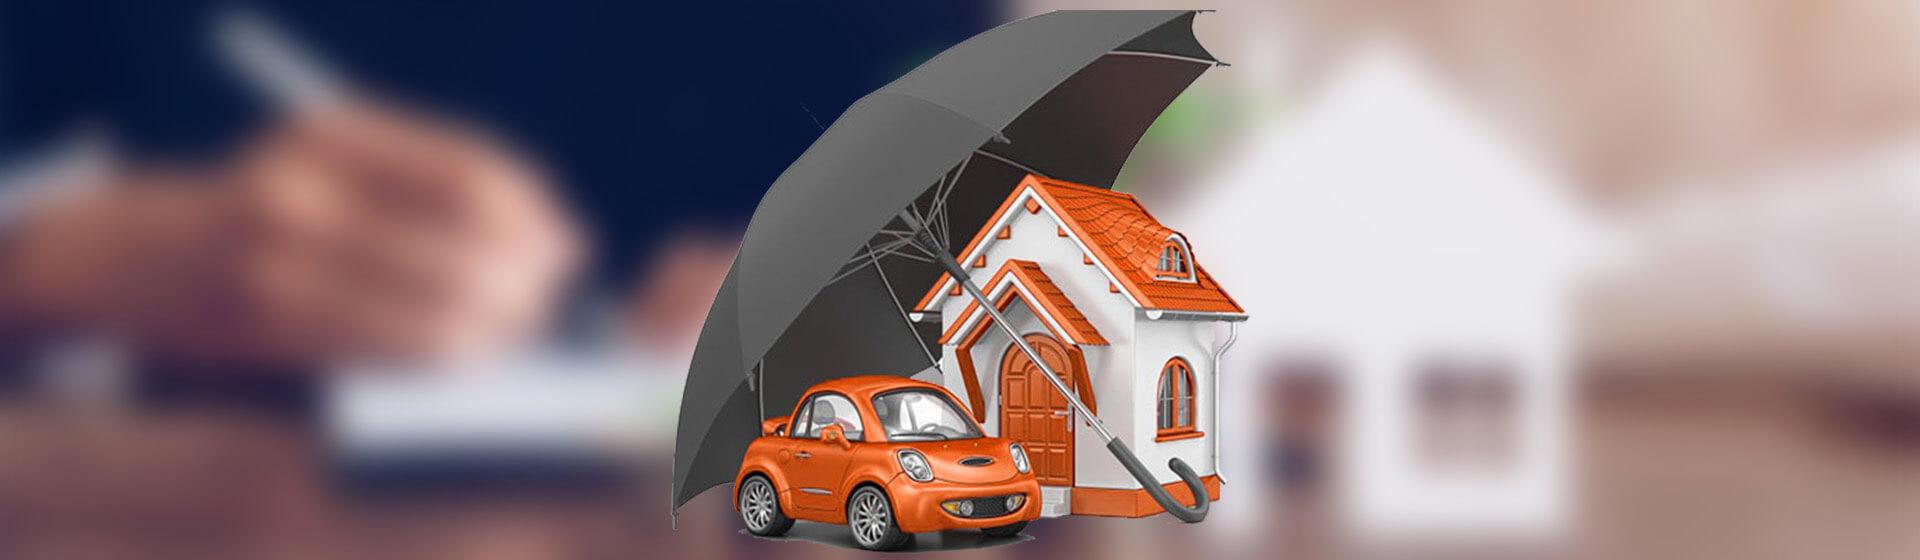 Insurance Premium Finance - Amica Saving & Credit LTD